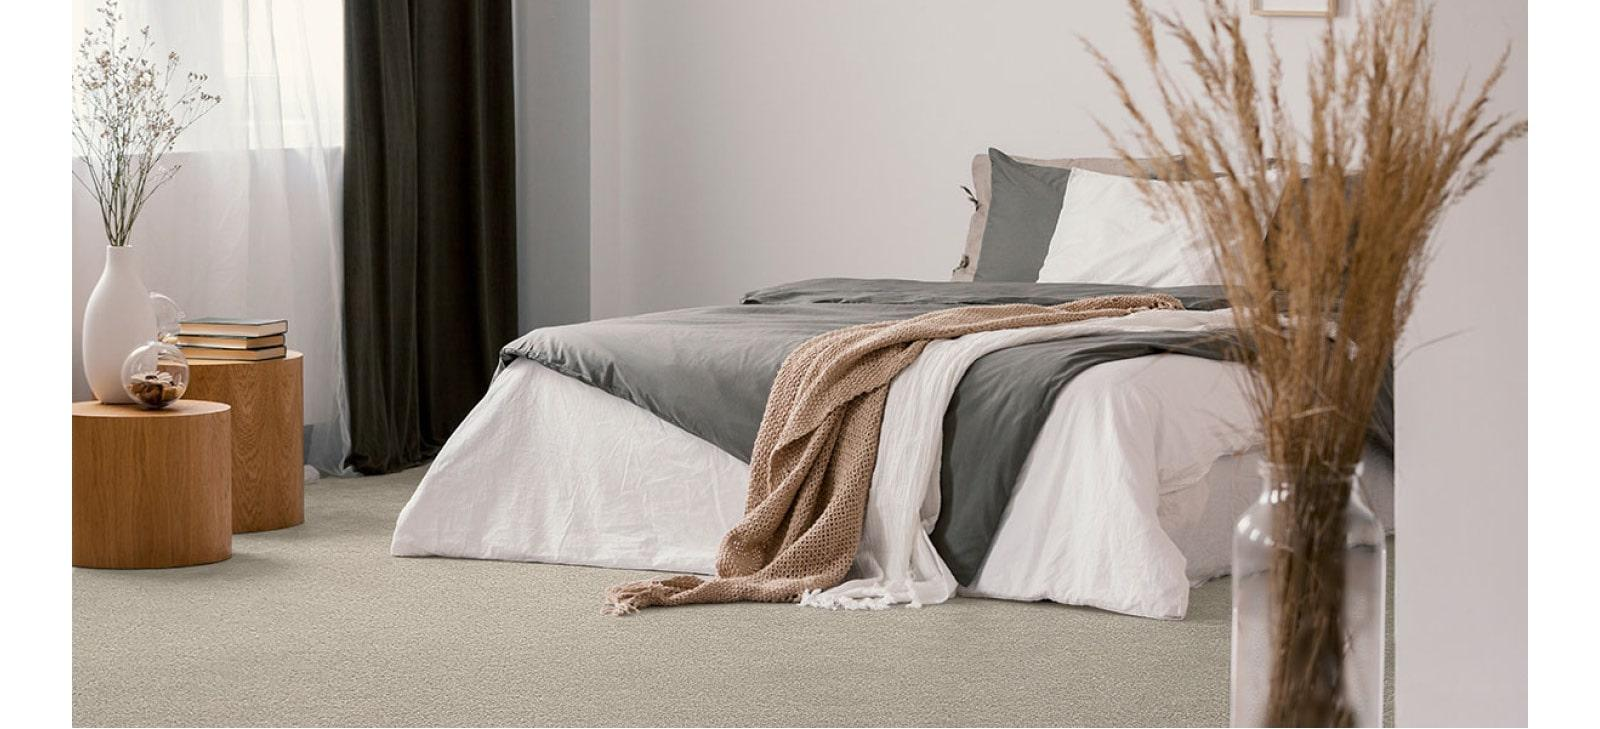 Large Bedroom Roomset with Beige Carpet